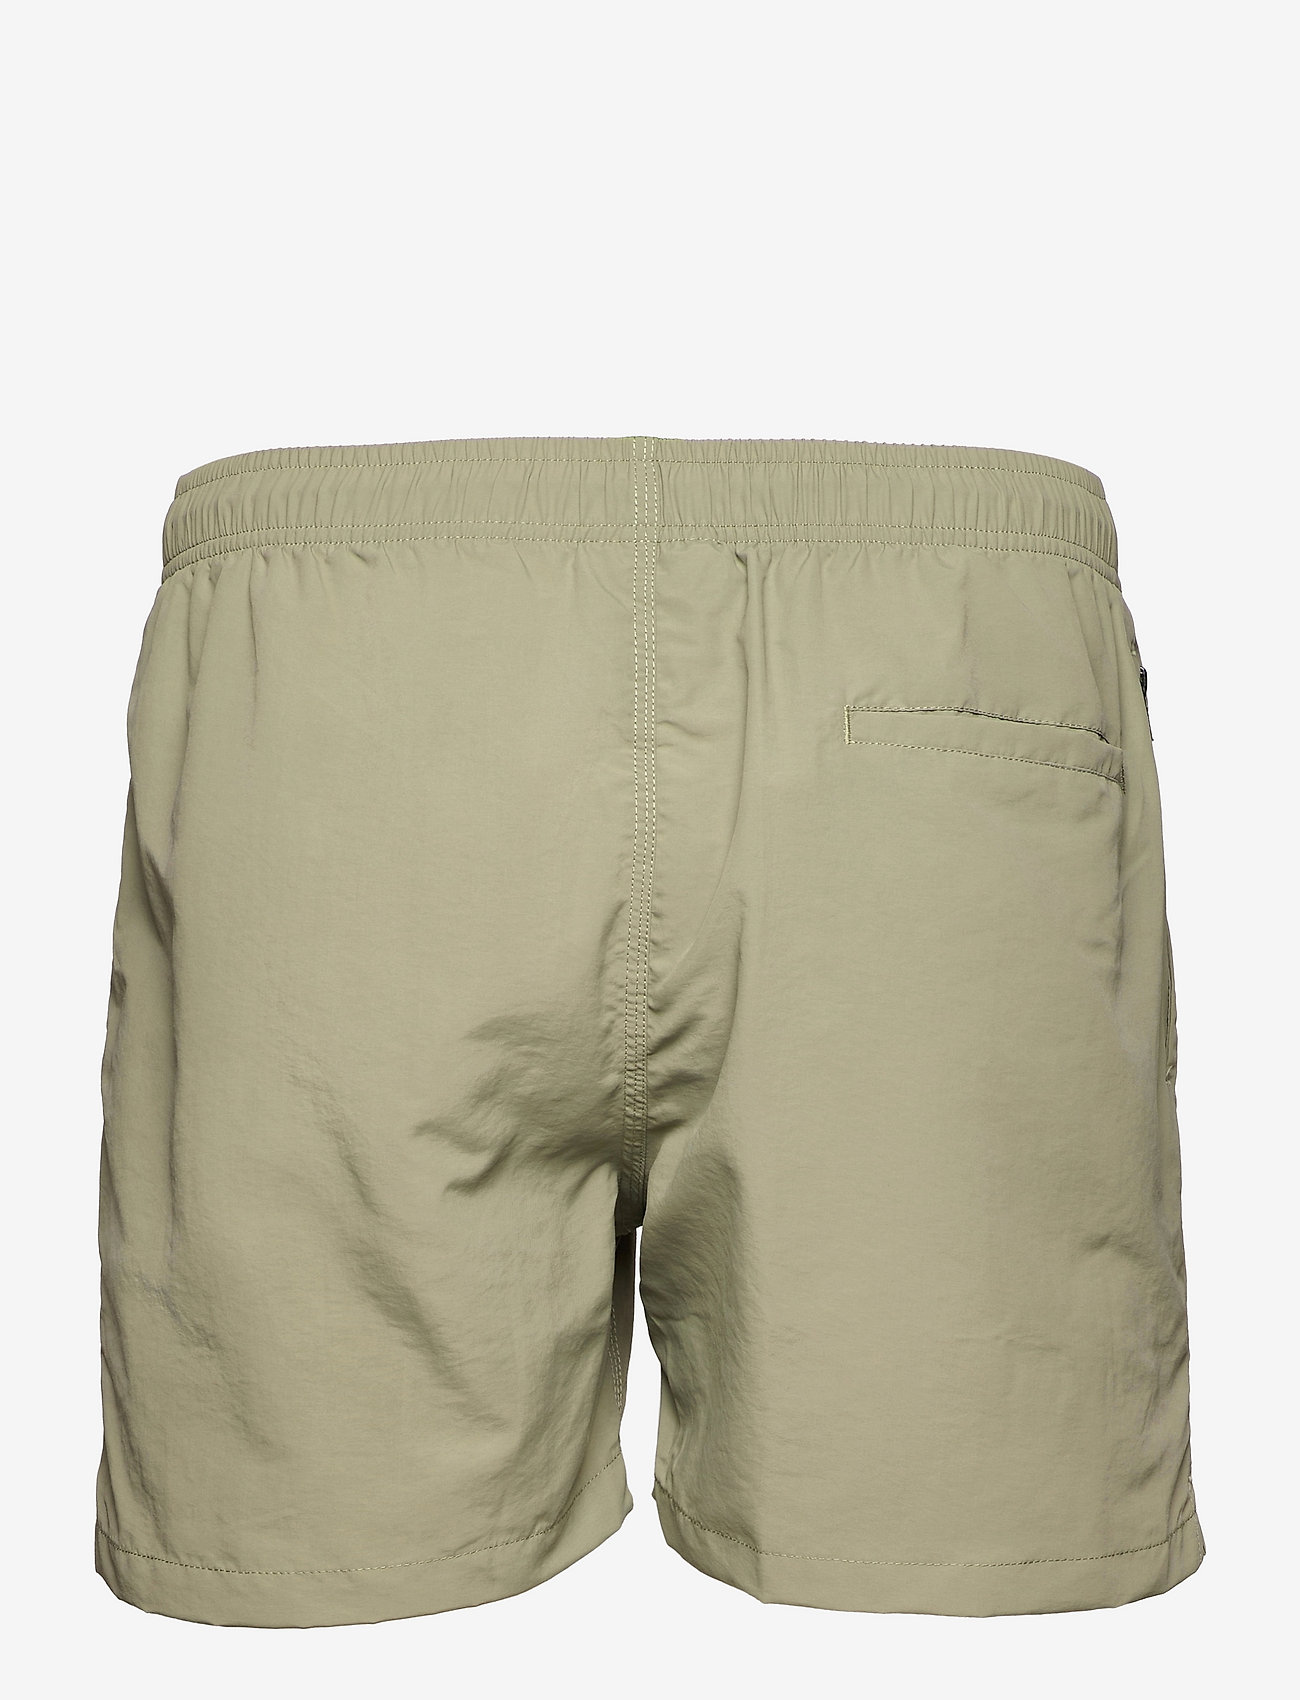 OAS - Green Nylon Swim Shorts - shorts - green - 1